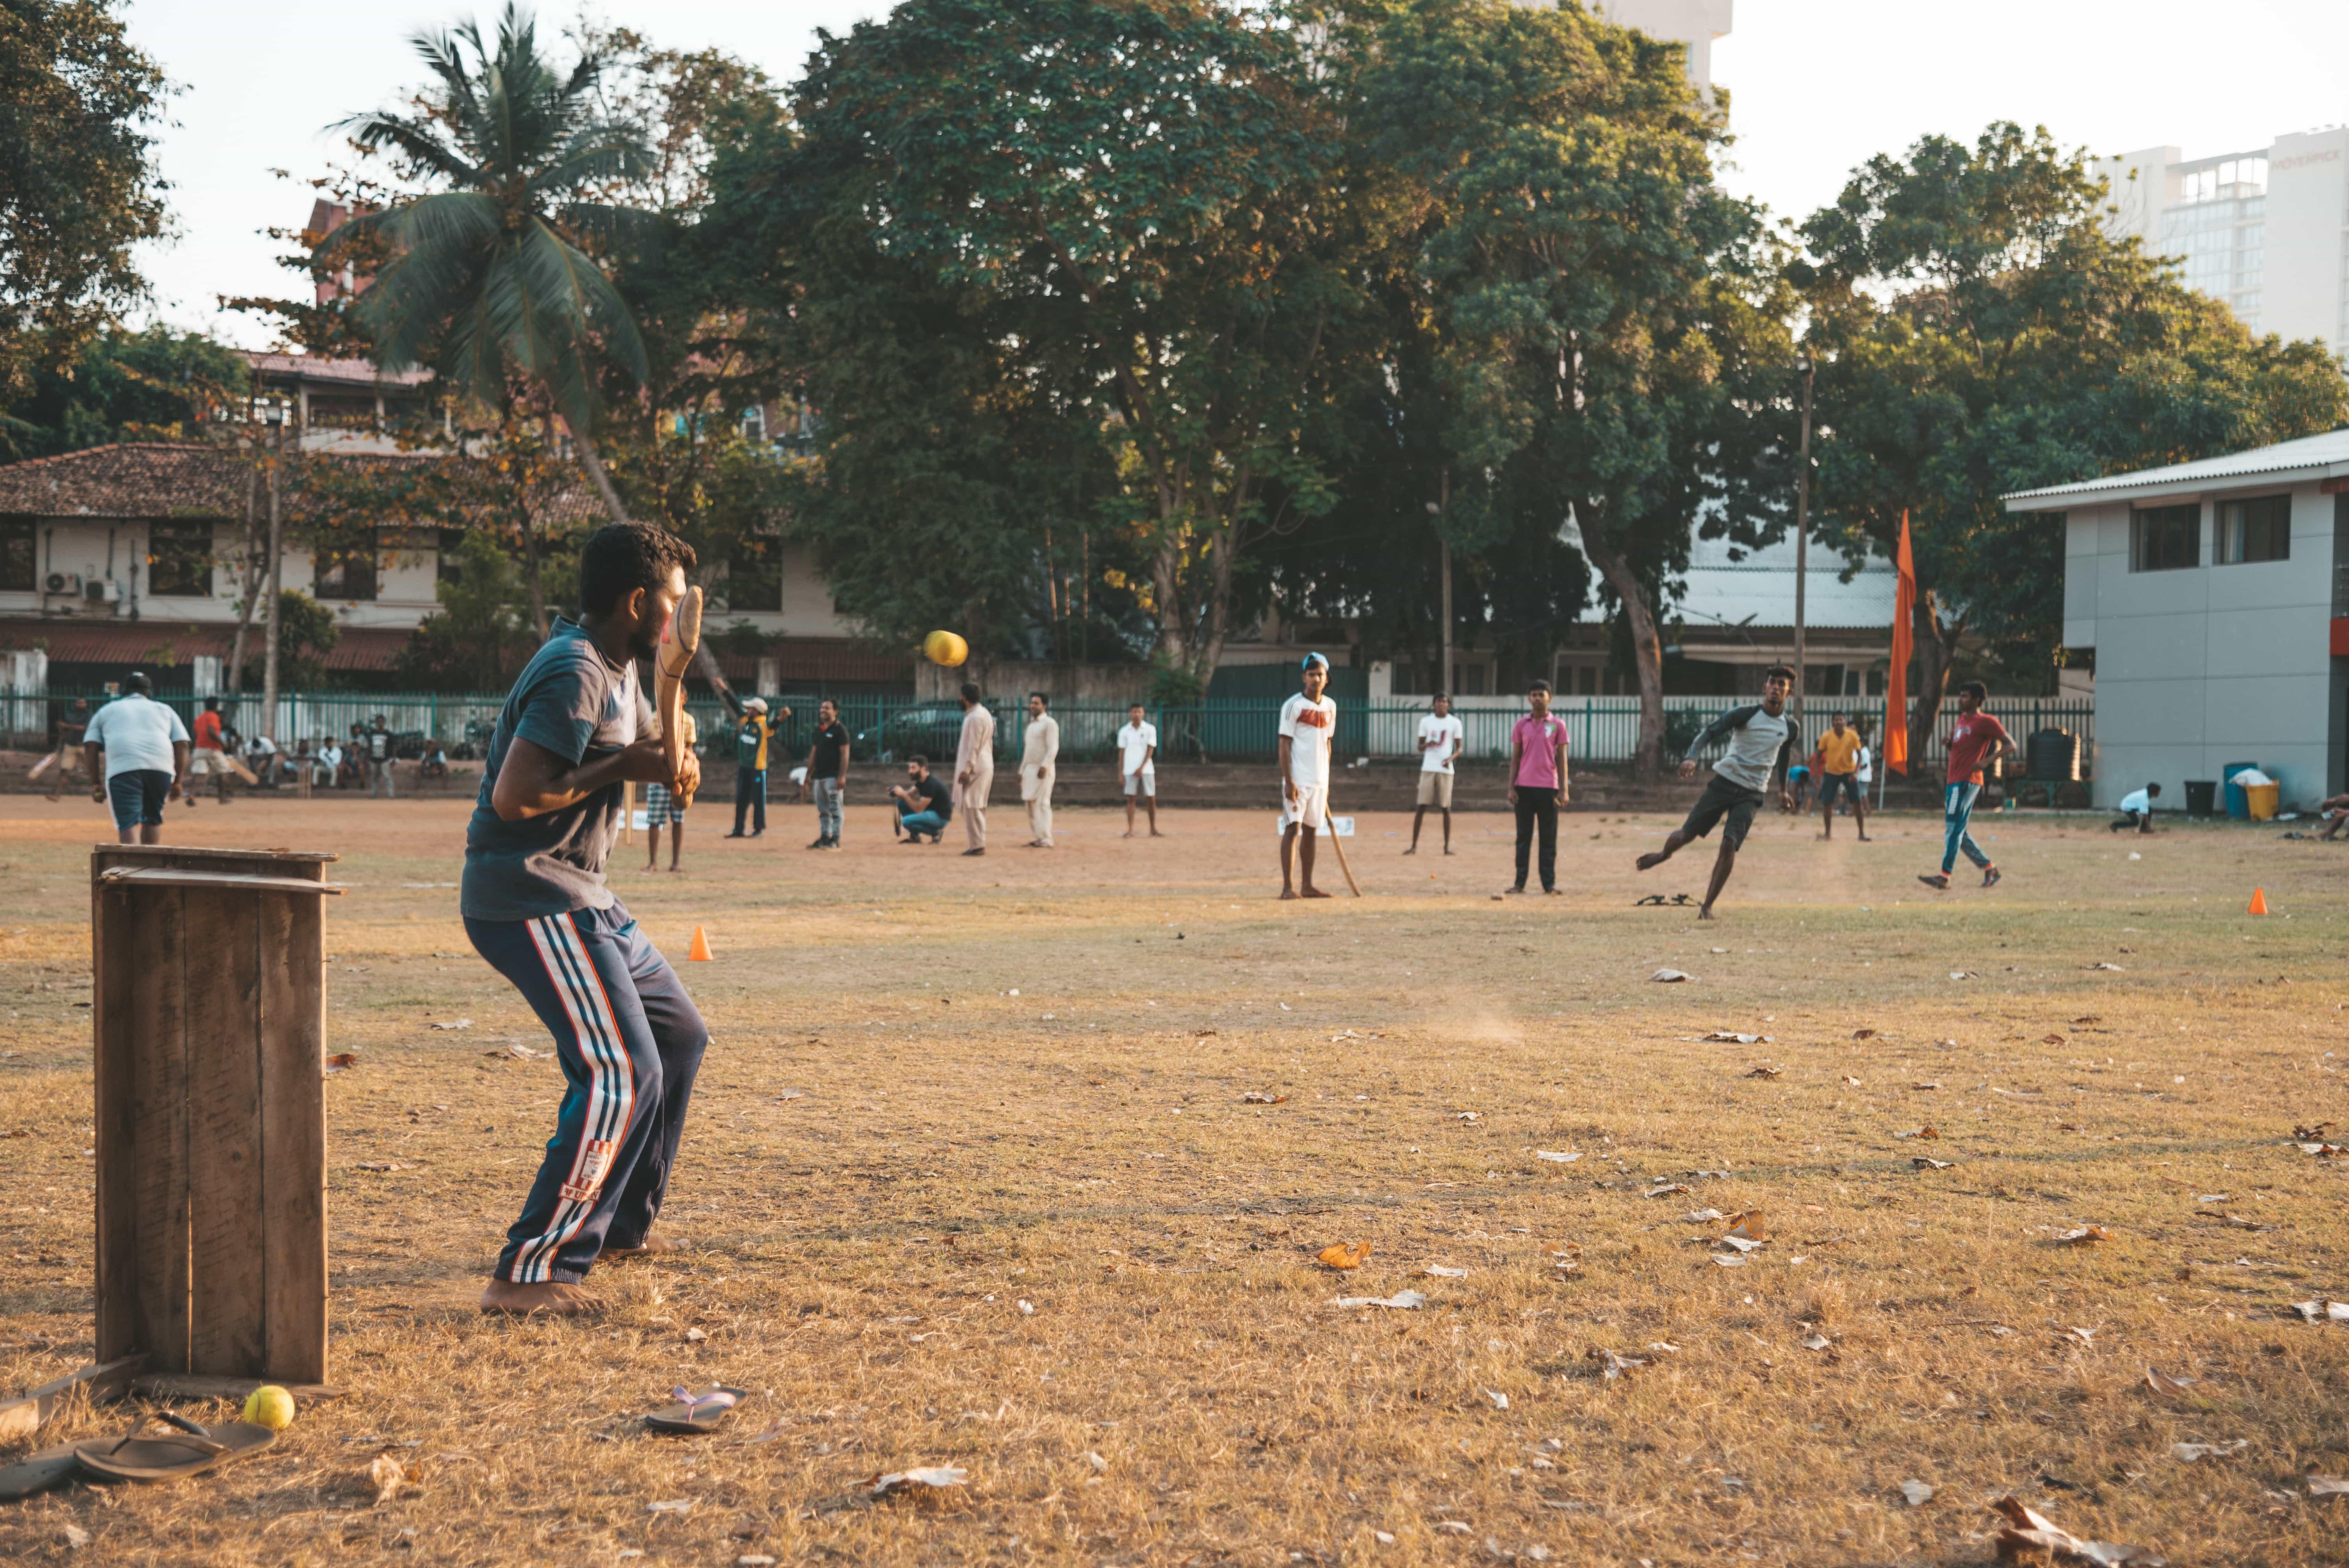 Playing cricket in Sri Lanka, things to do in Sri Lanka, Sri Lanka travel guide